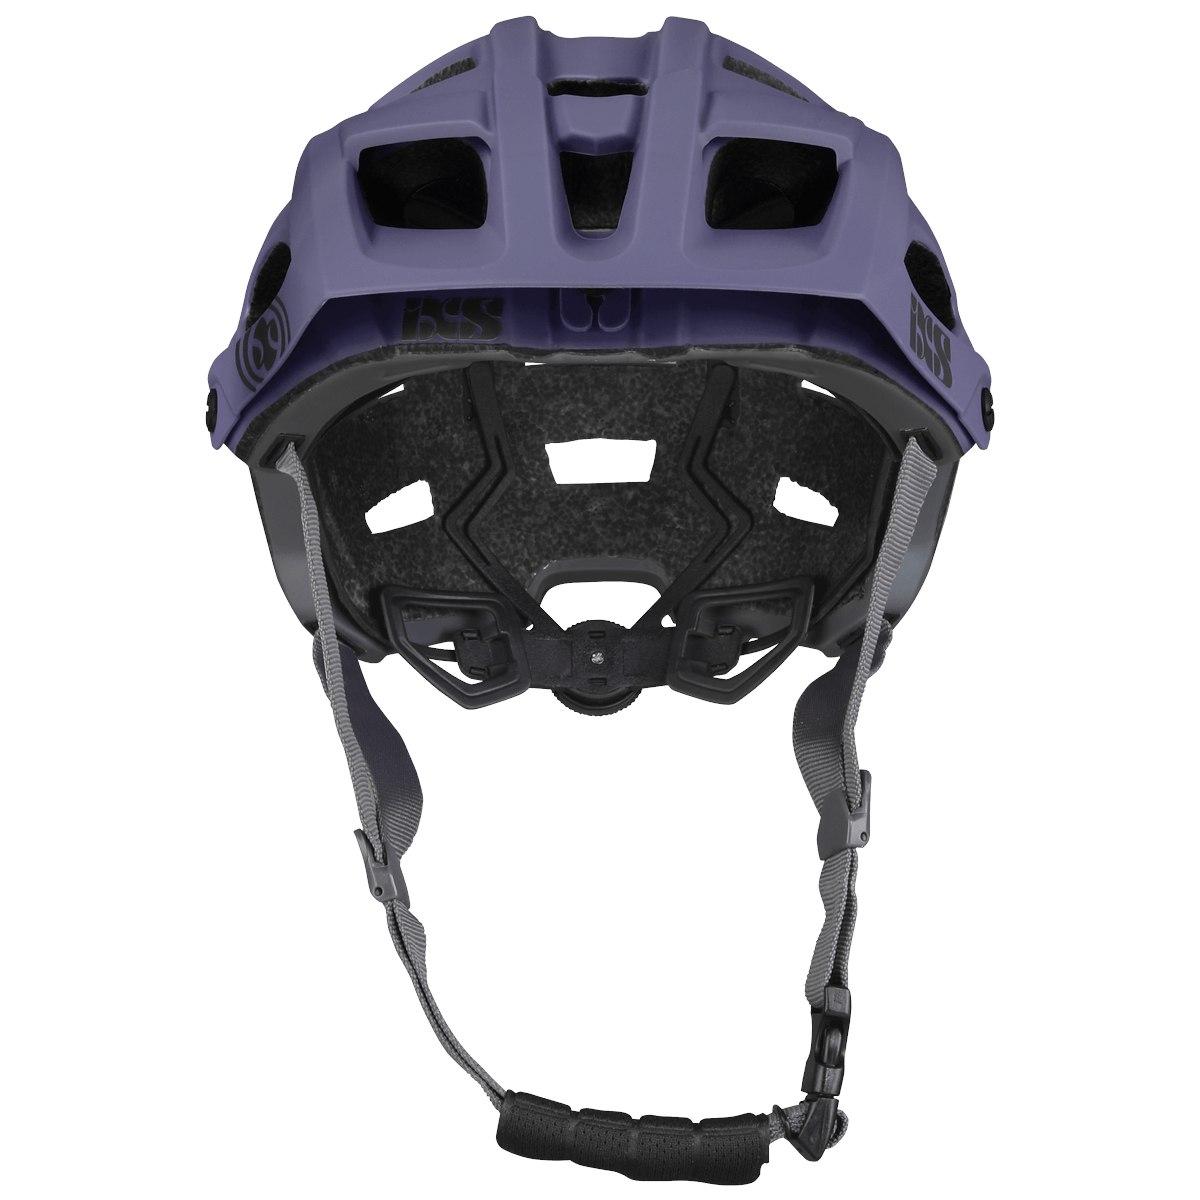 Image of iXS Trail EVO Helmet - grape